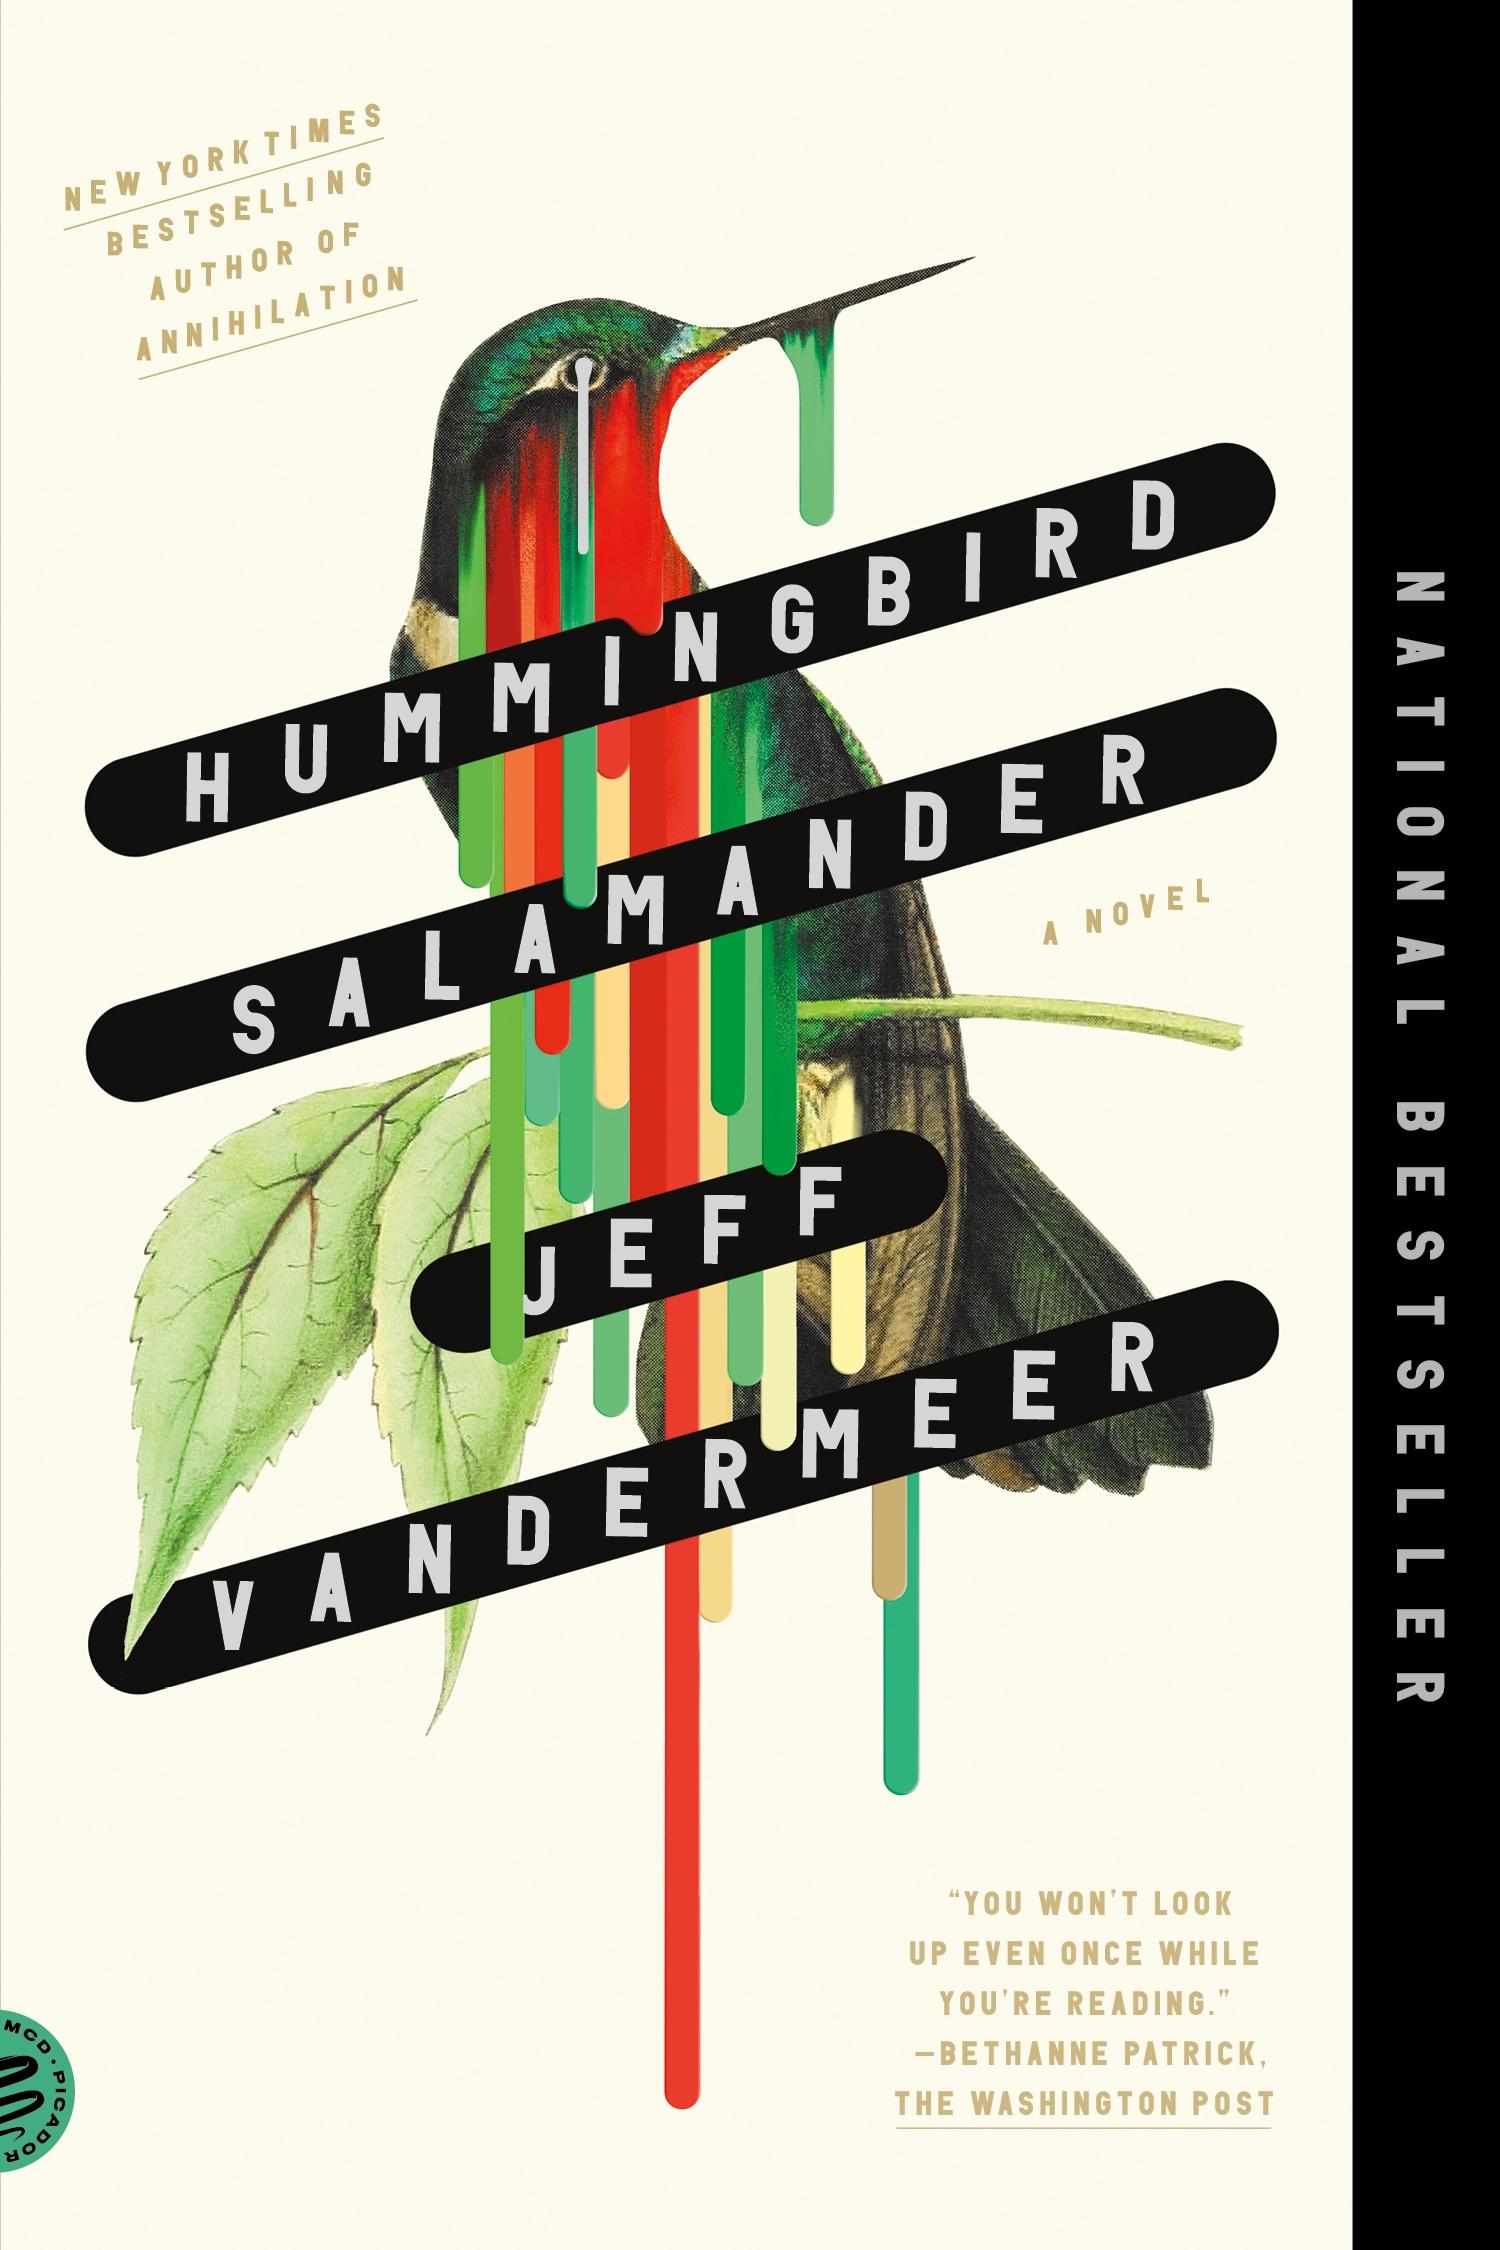 Hummingbird Salamander A Novel